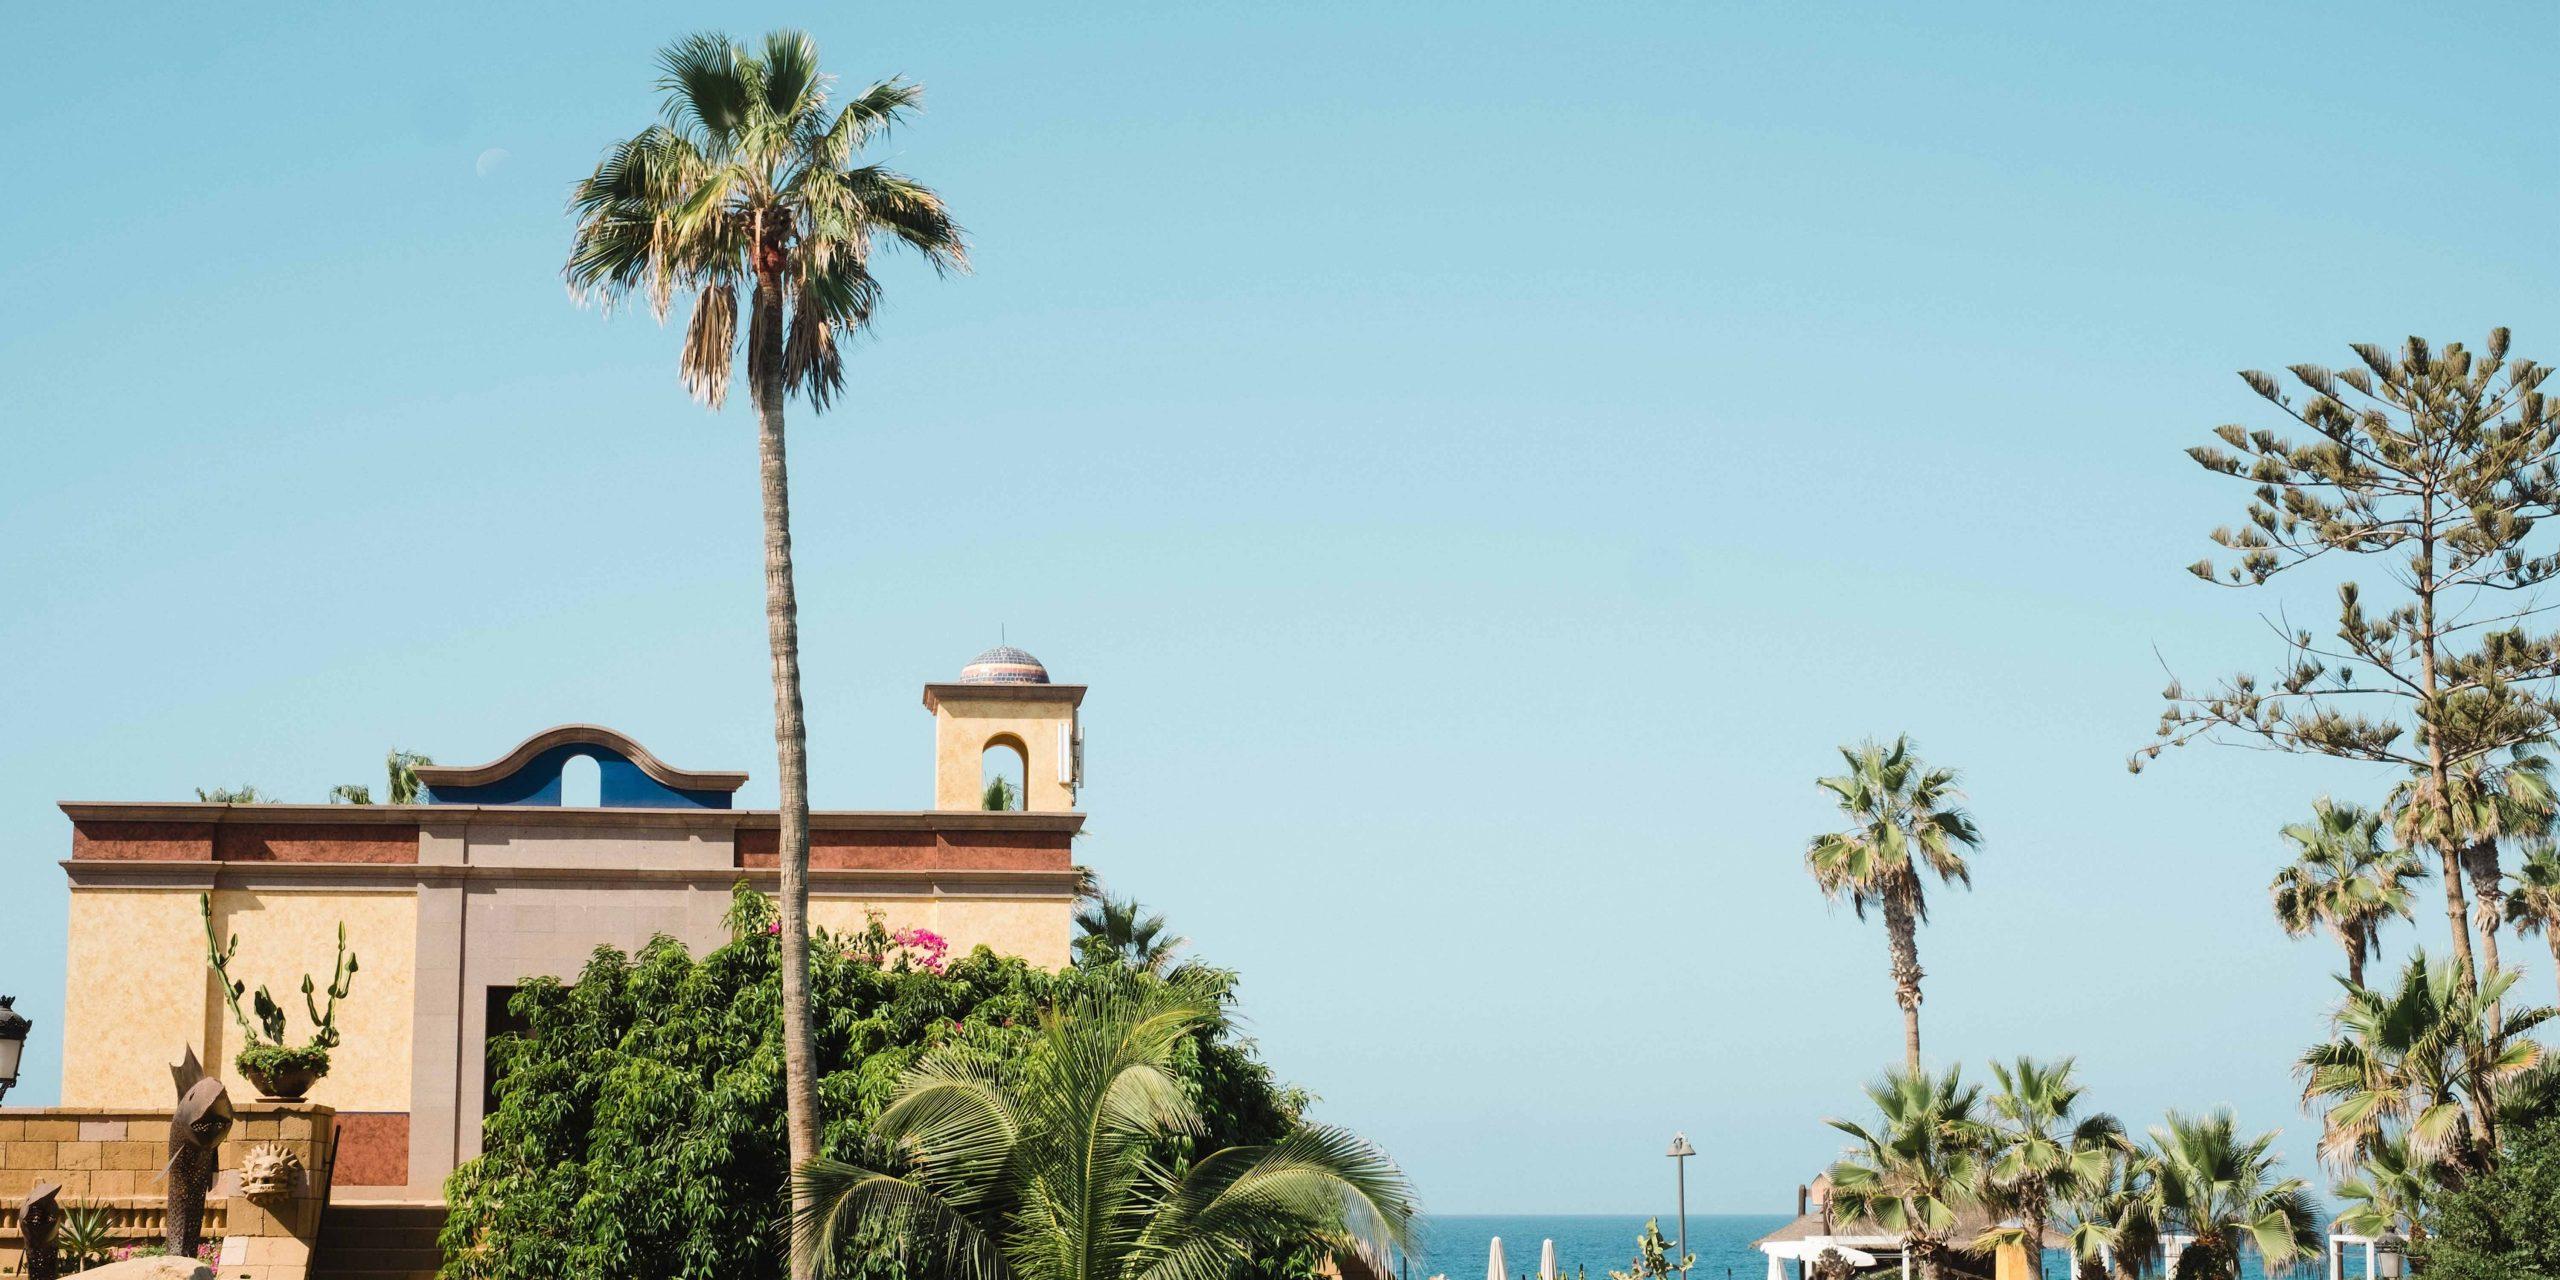 Hotel_VIlla_Cortes_home